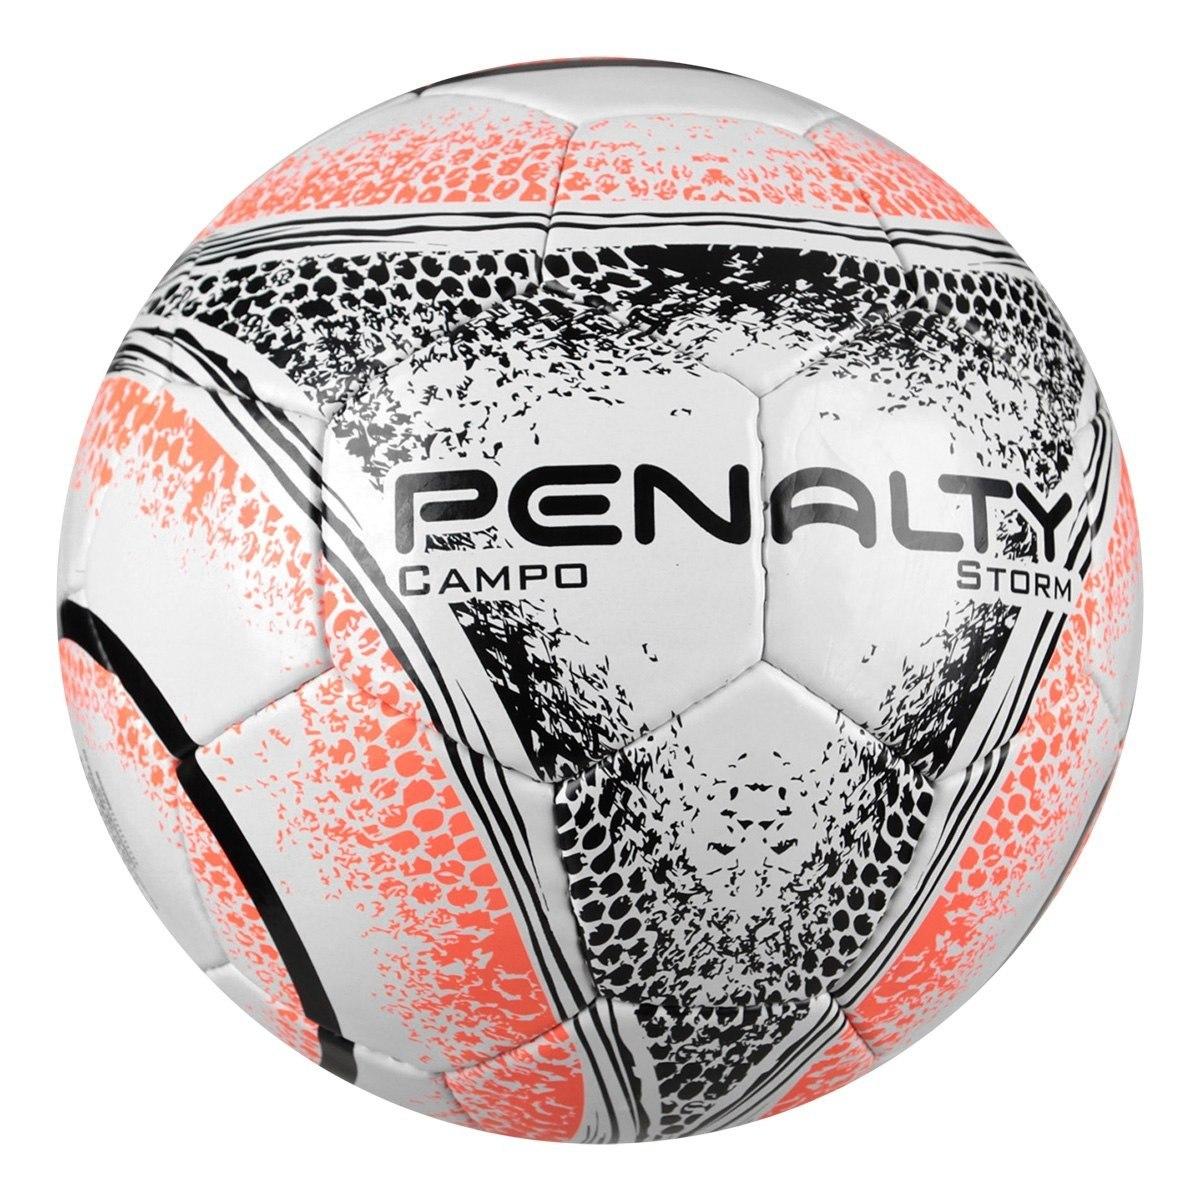 14e3d9a386507 Bola Futebol Campo Penalty Storm C c Viii - Branco E Preto - R  69 ...